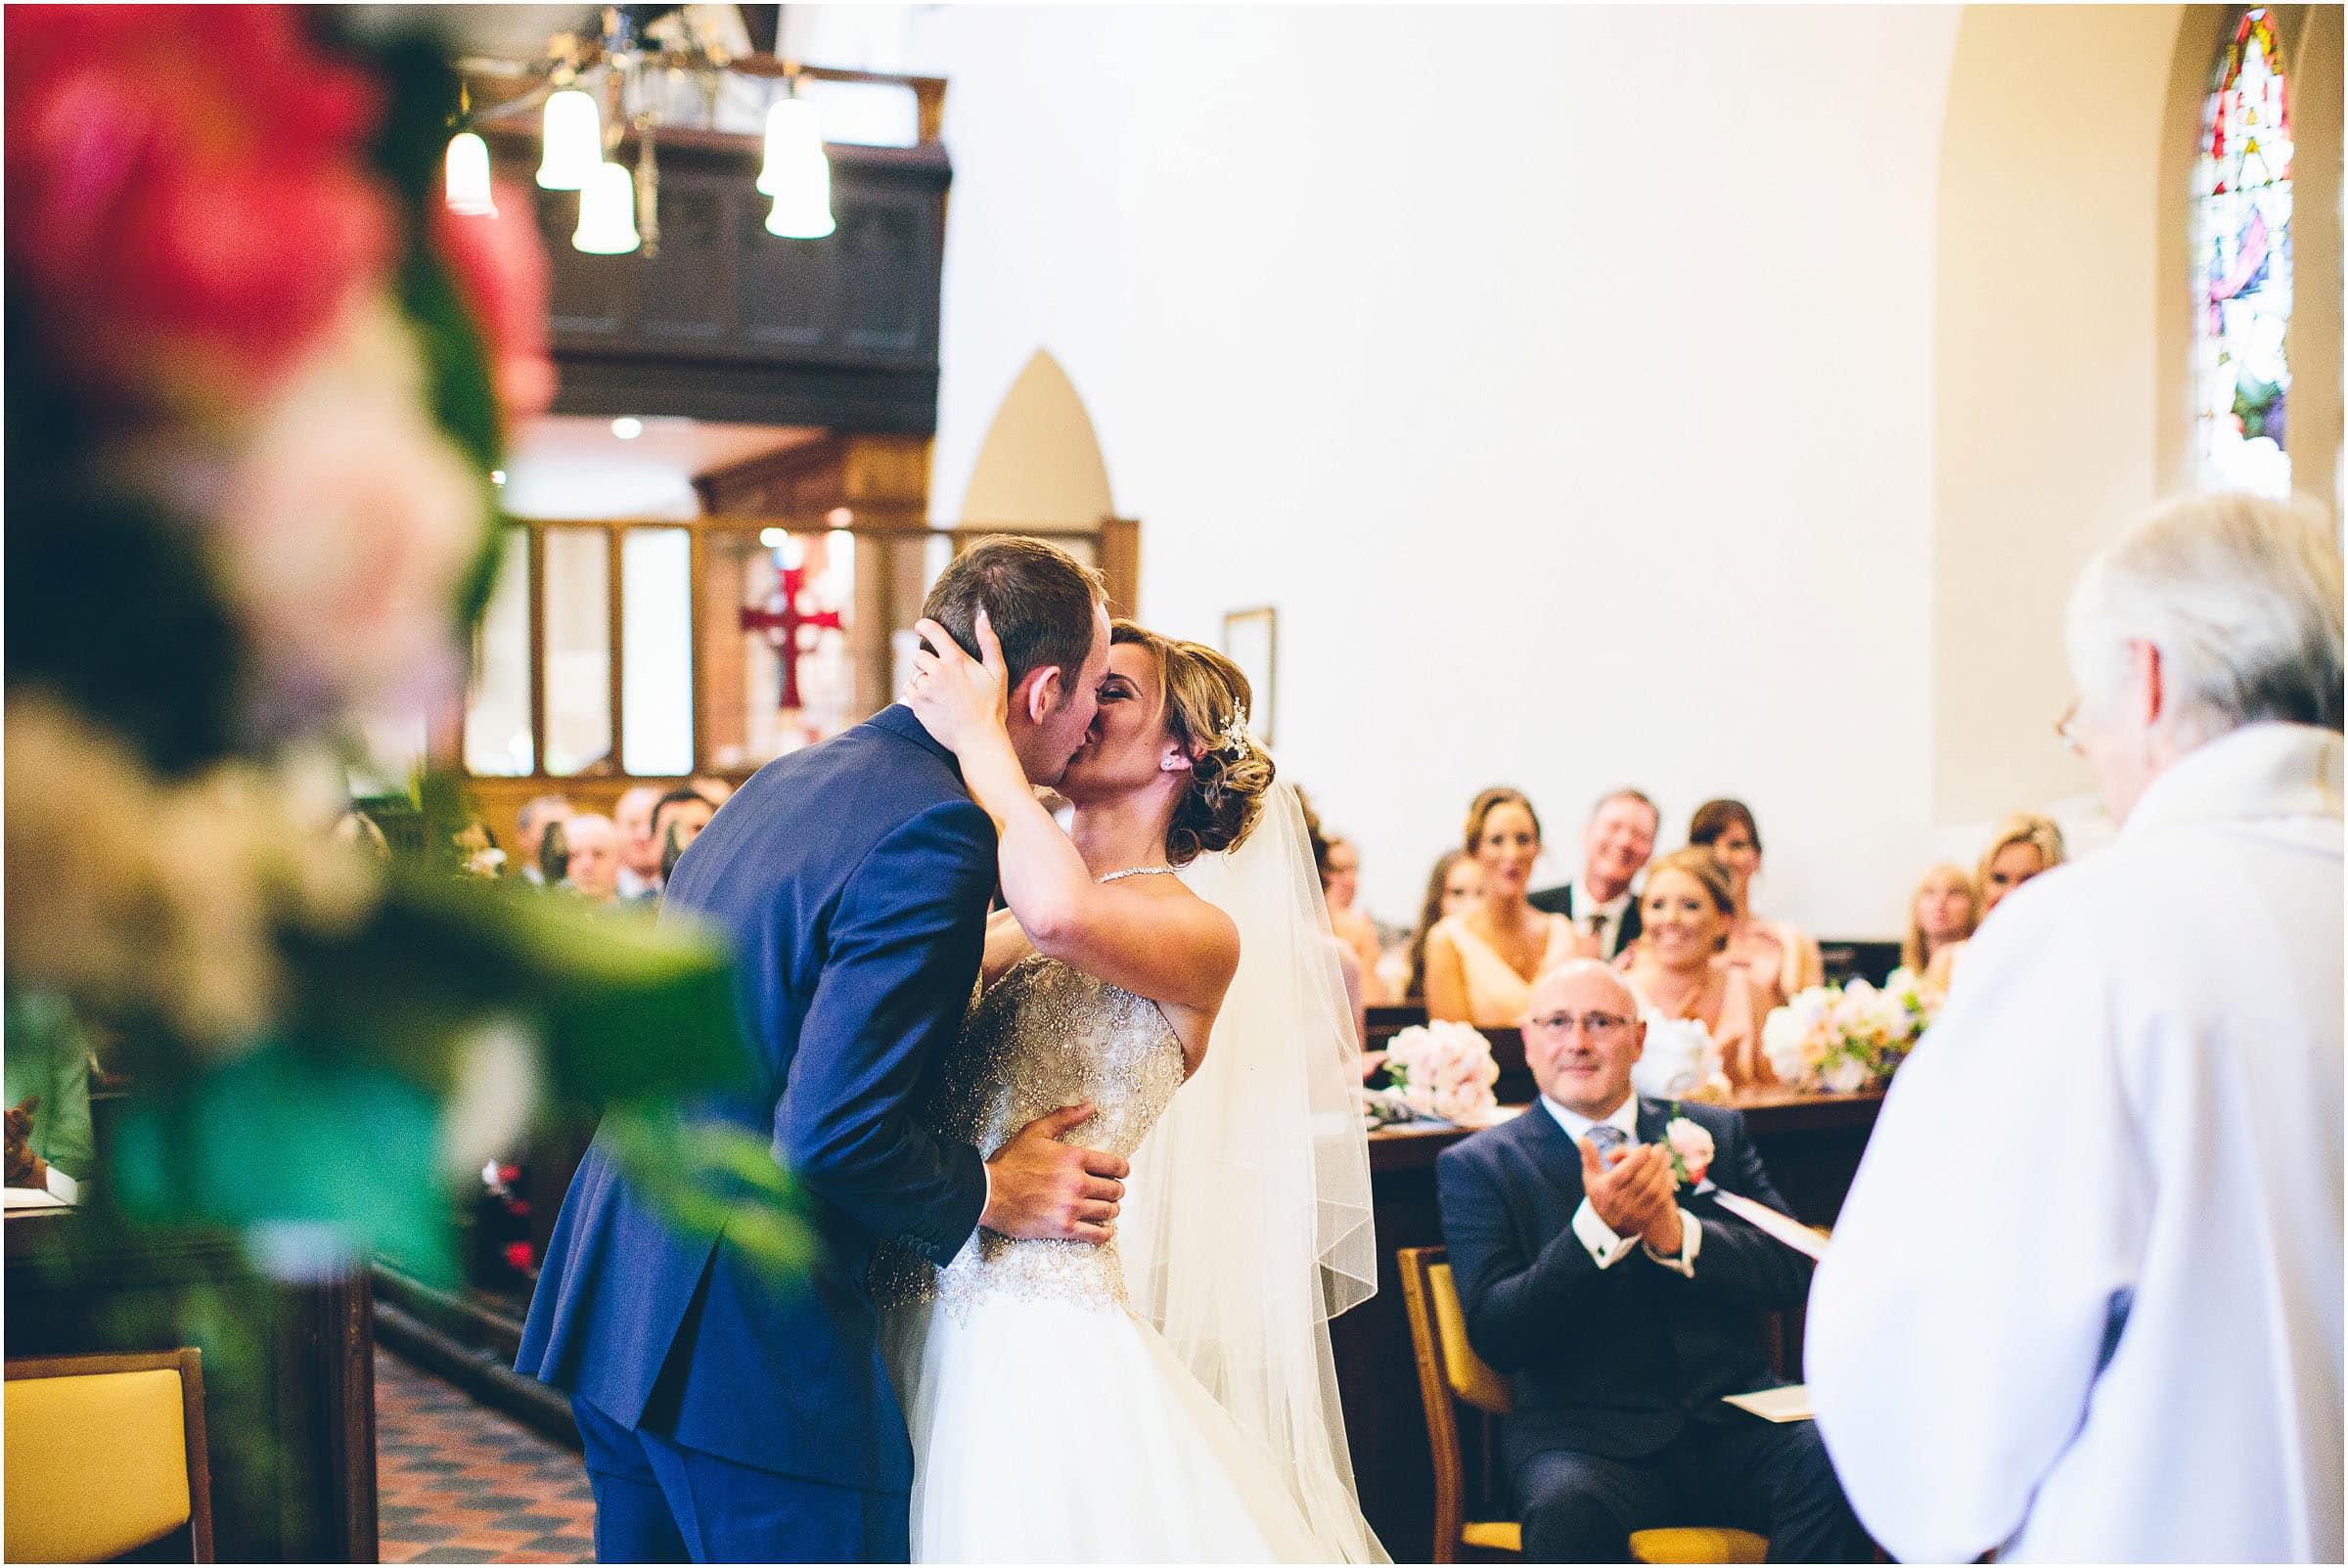 Mitton_Hall_Wedding_Photography_0053